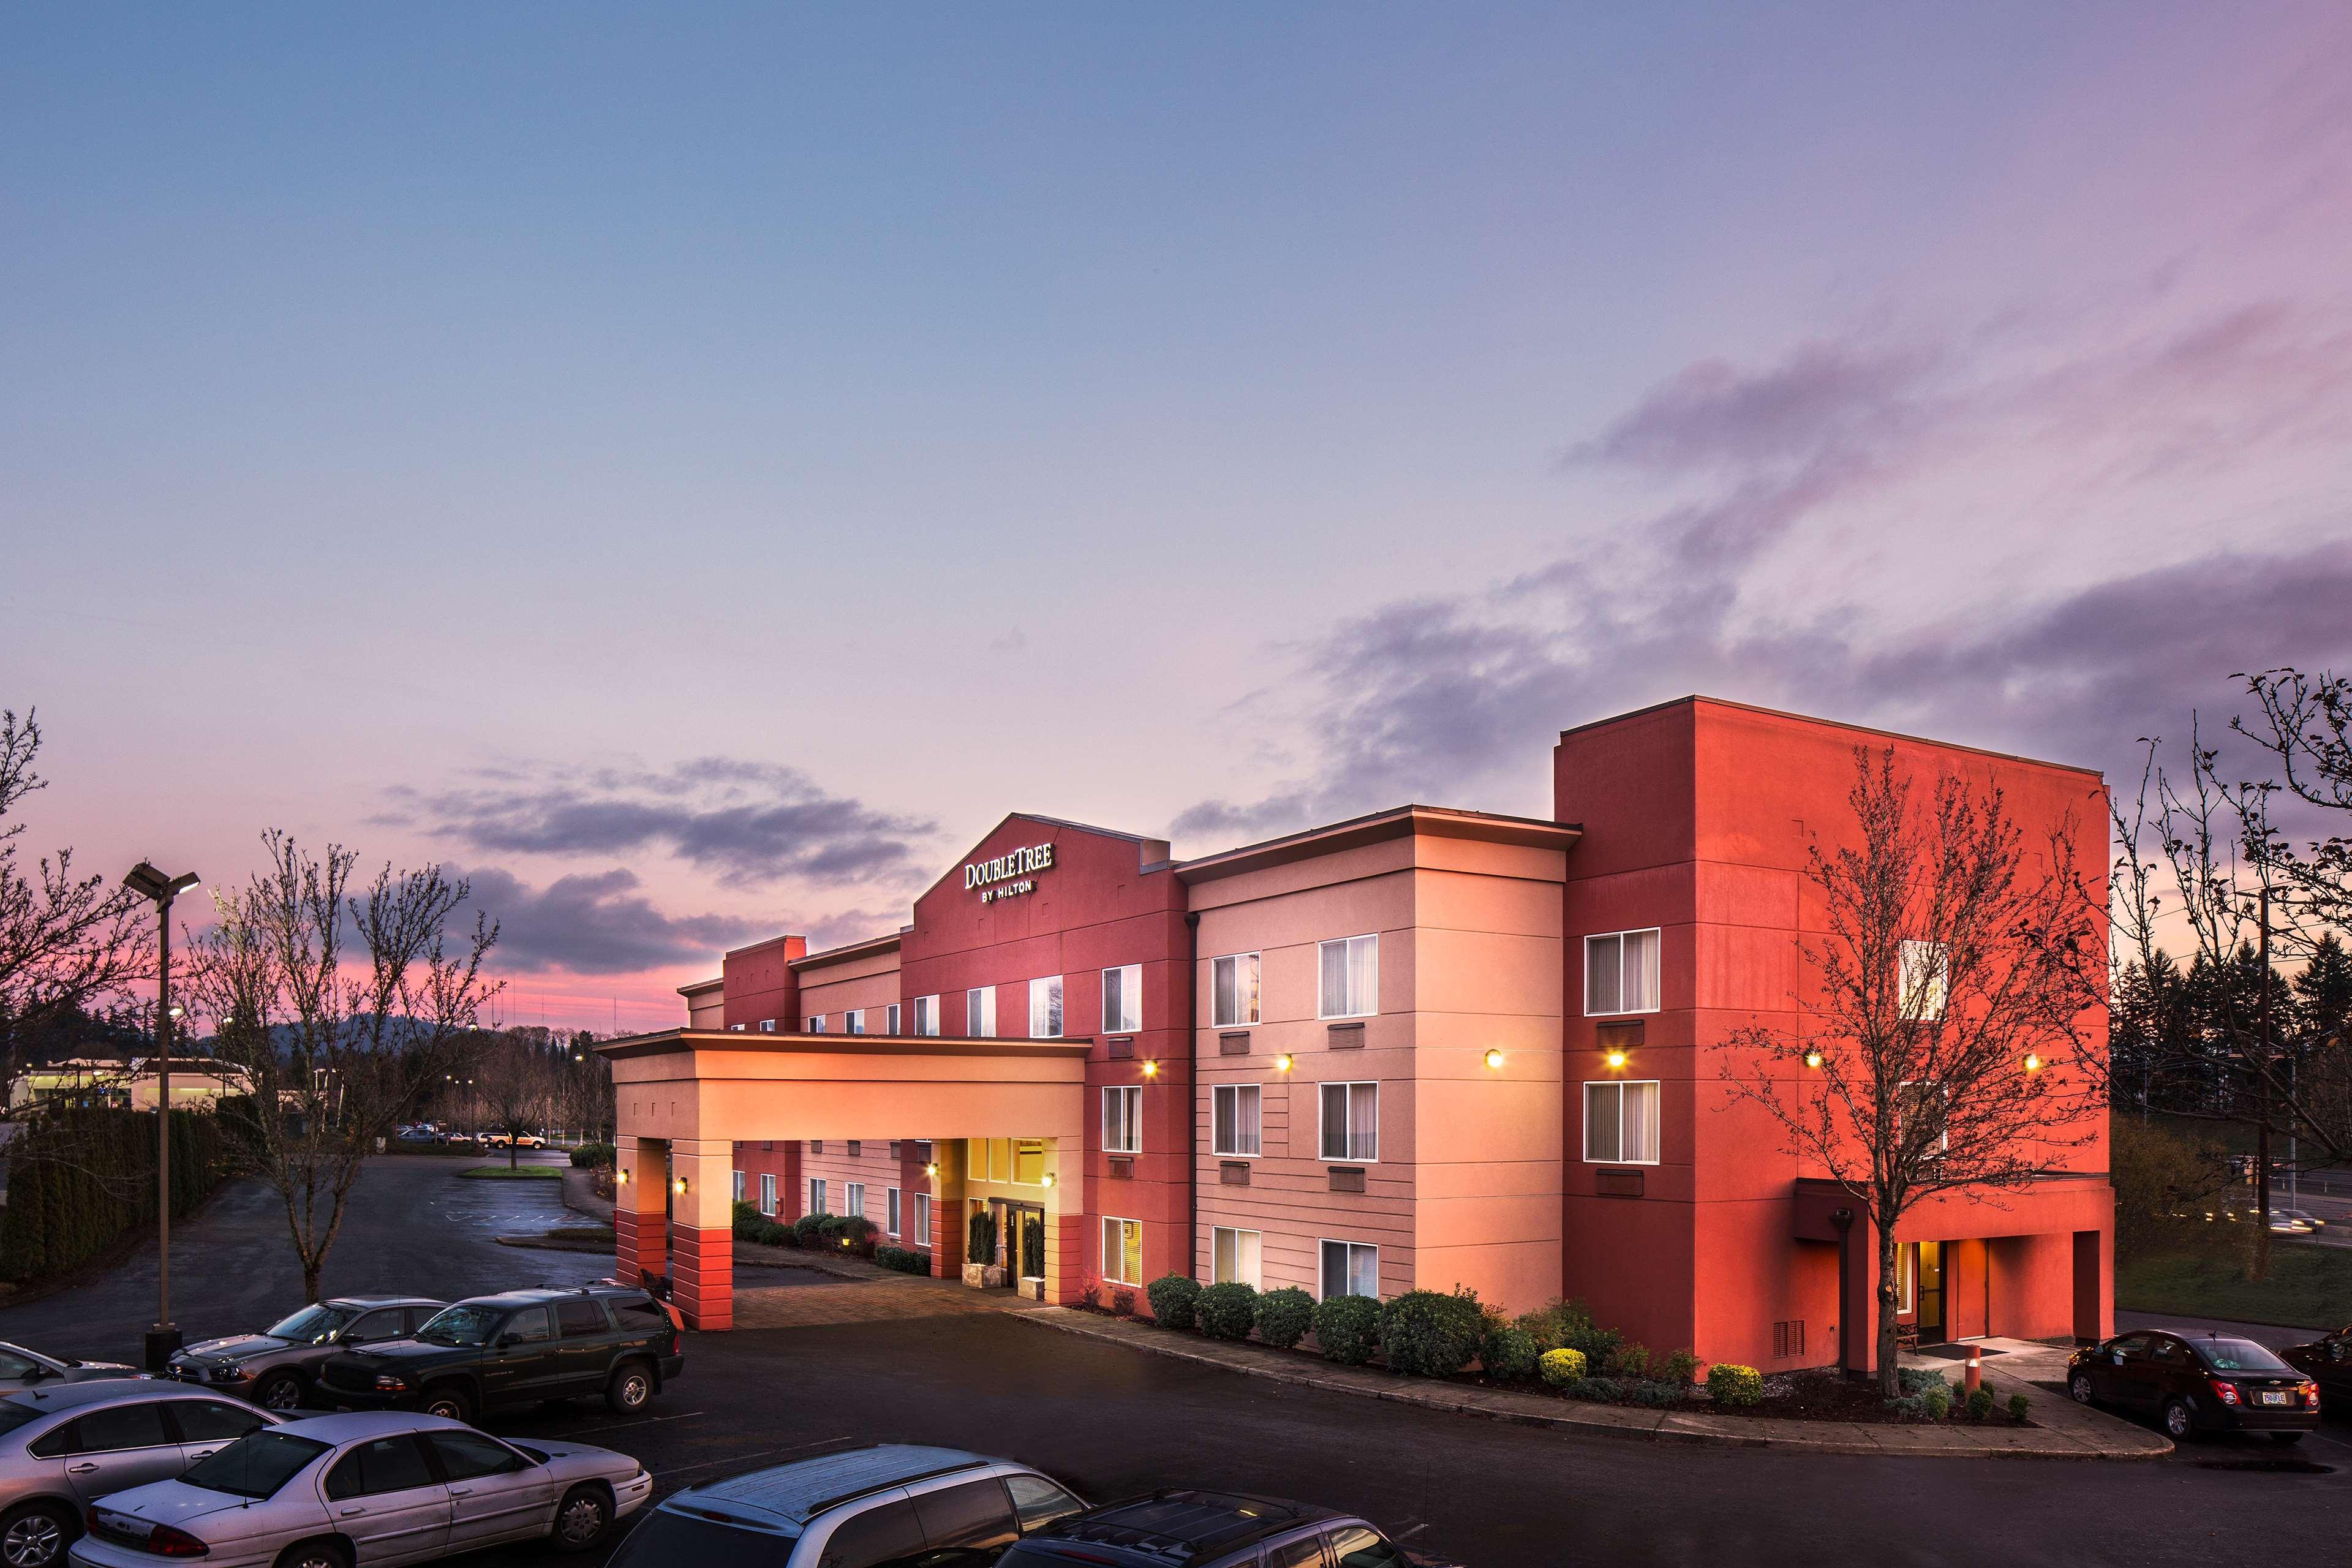 DoubleTree by Hilton Beaverton, Washington